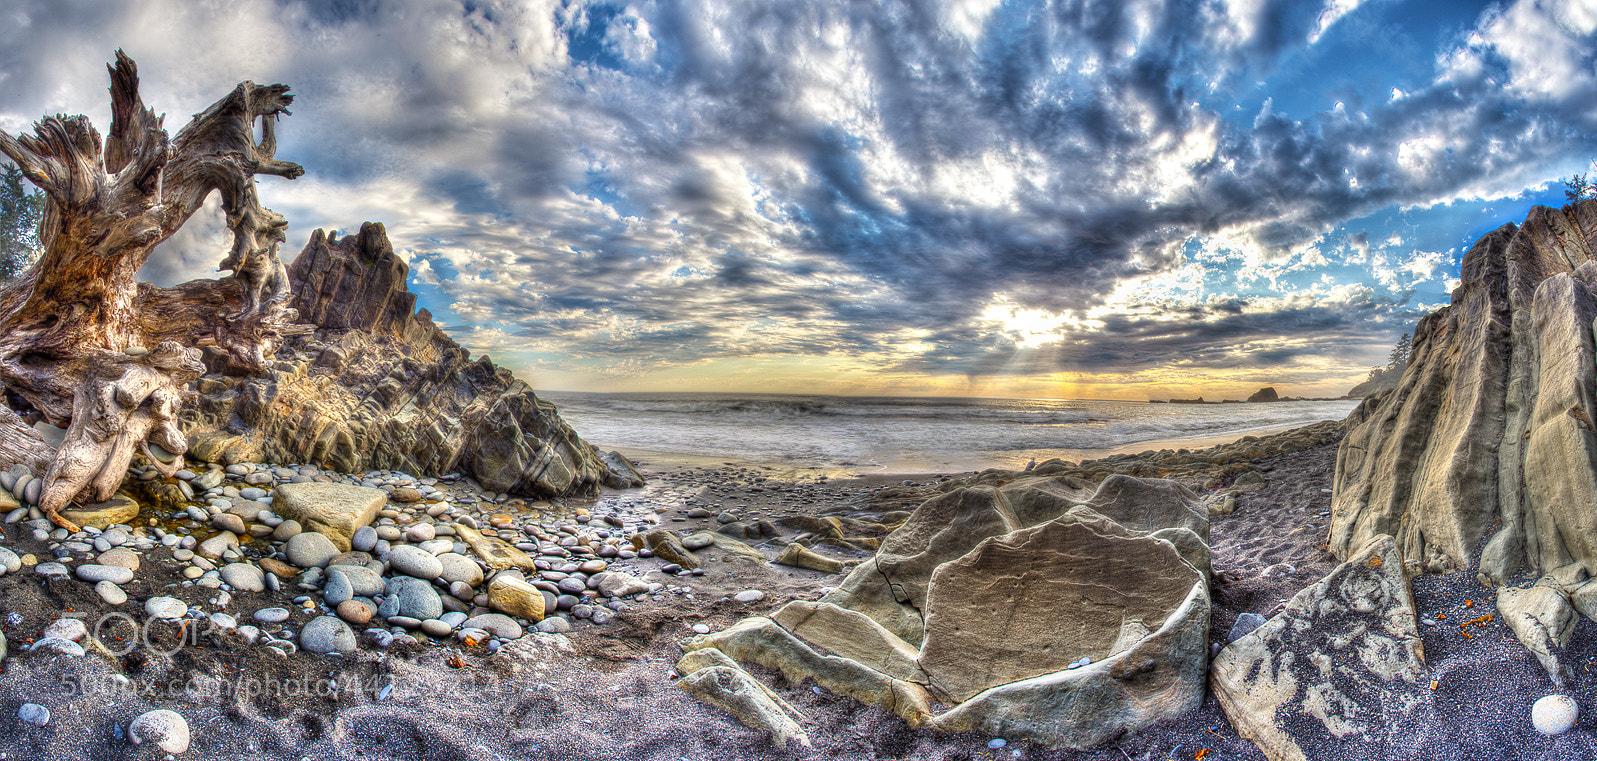 Photograph Wild Beach by Alex Gubski on 500px